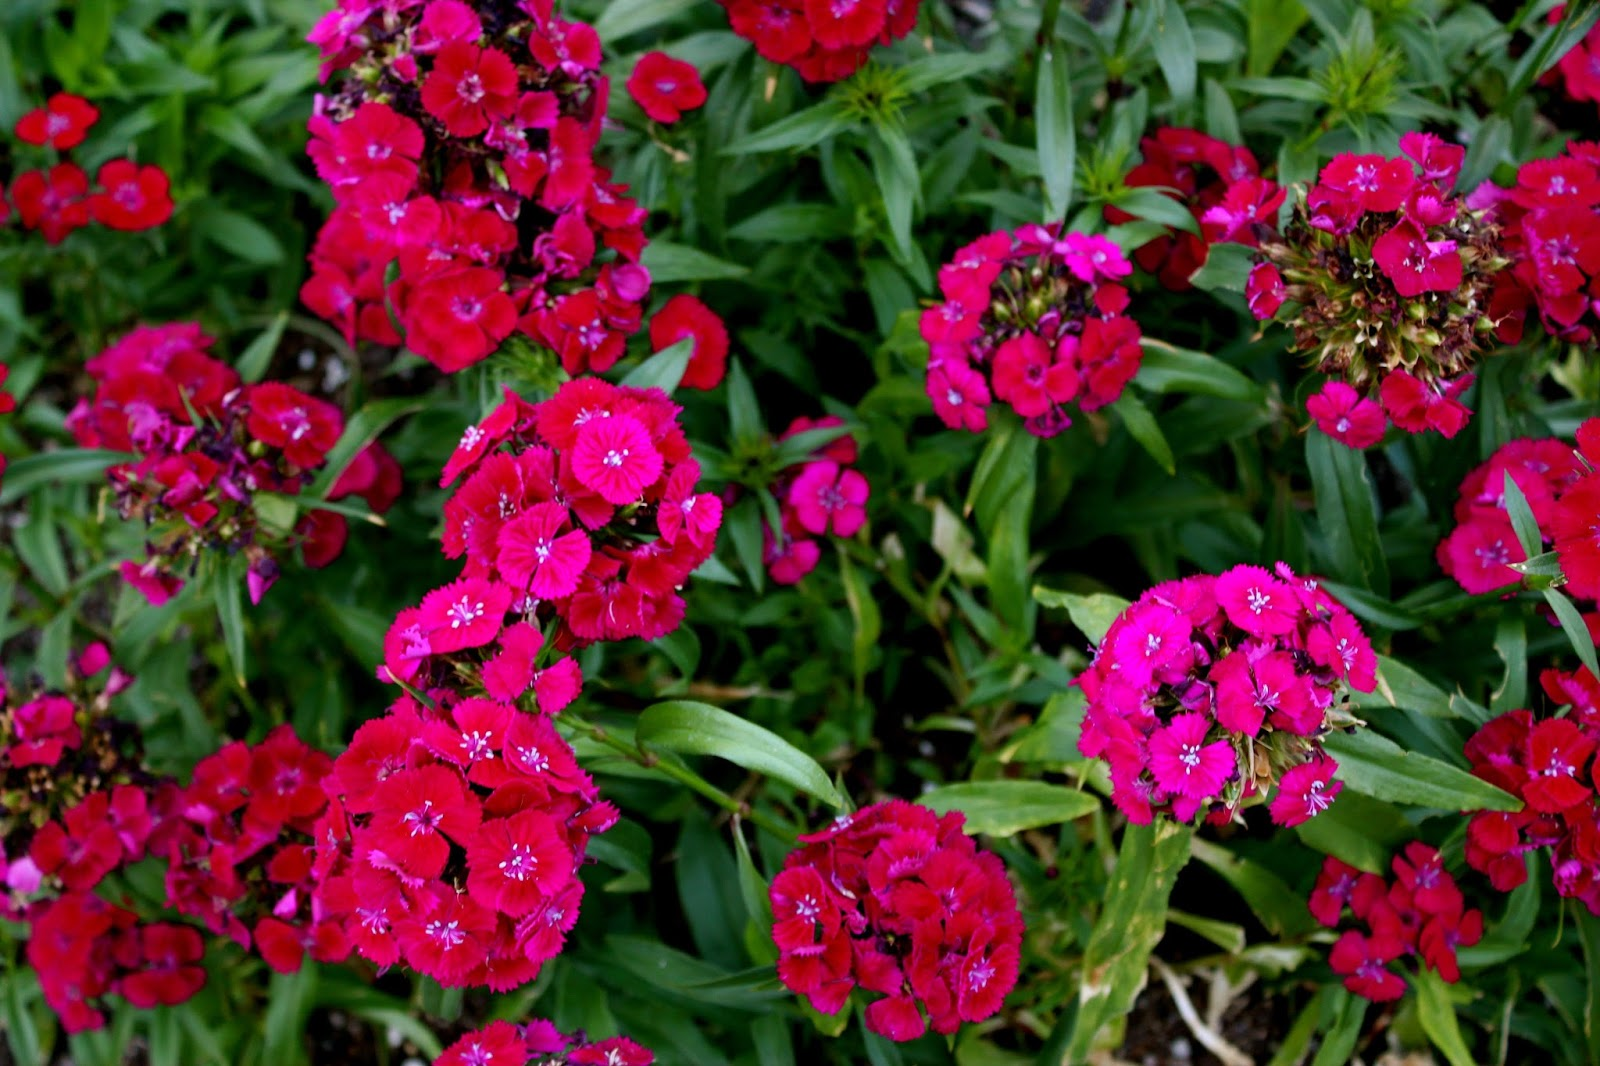 bossy betty monday morning flowers